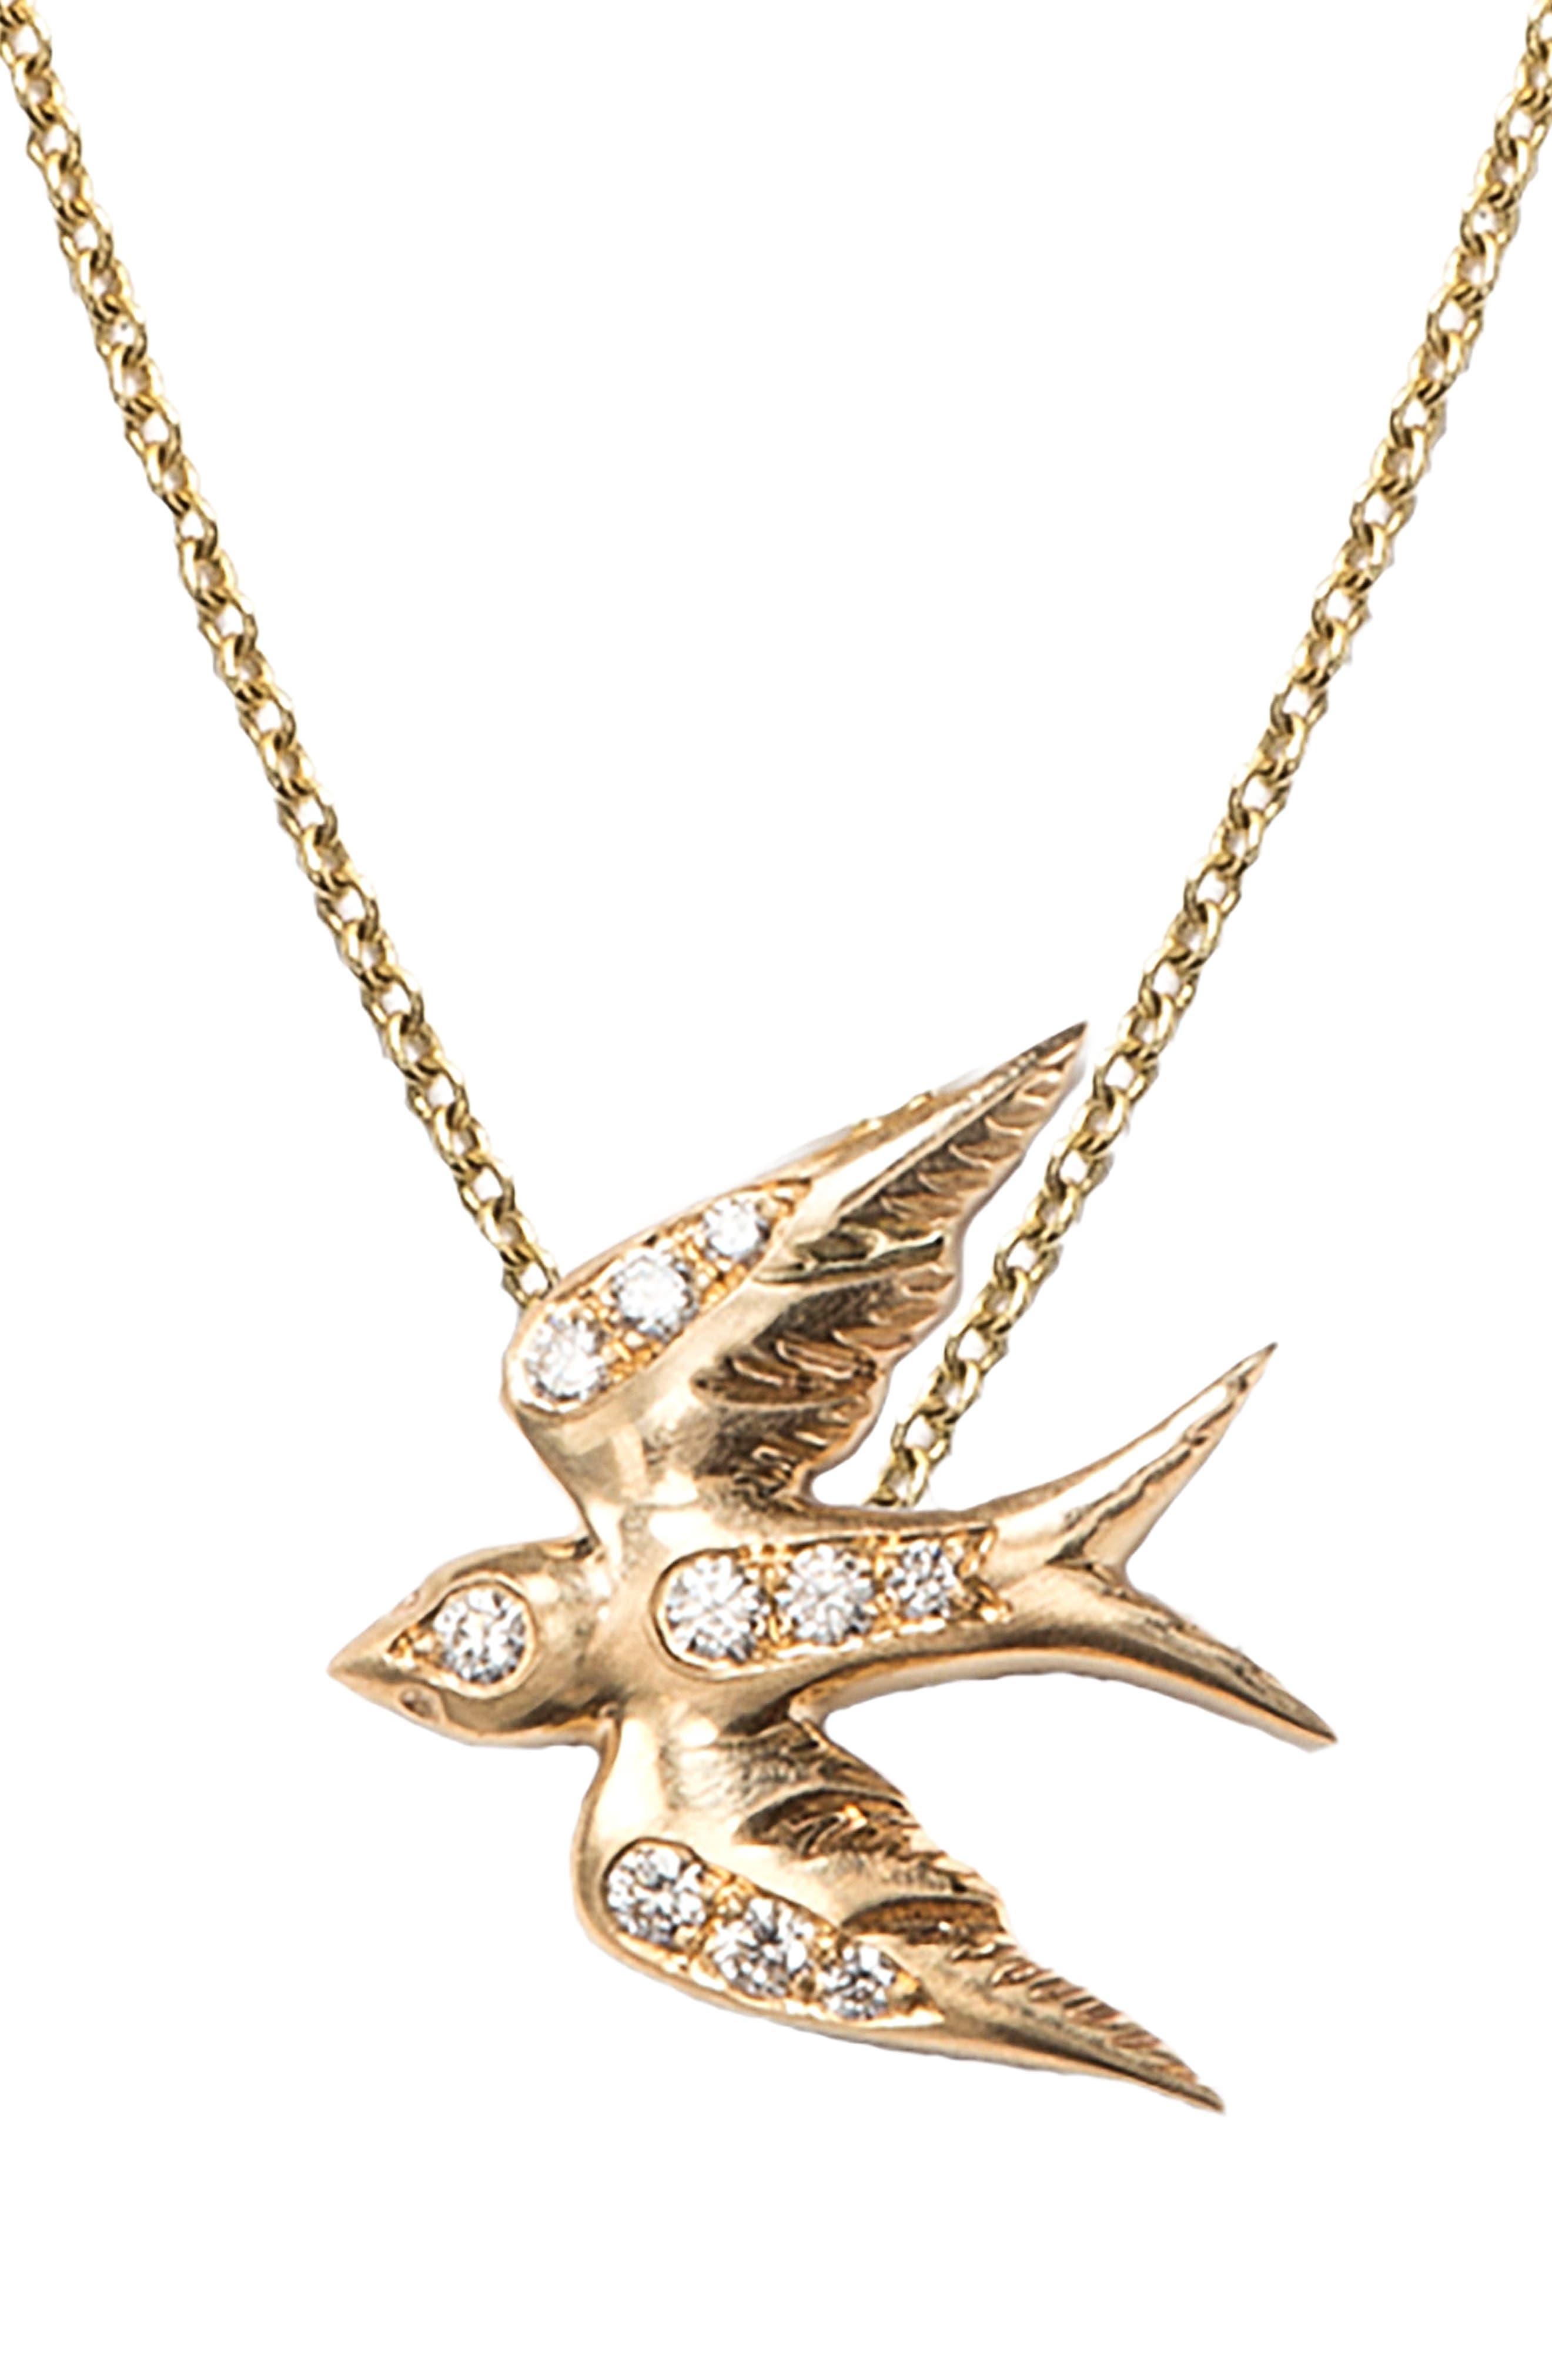 Diamond Swallow Pendant Necklace,                             Main thumbnail 1, color,                             YELLOW GOLD